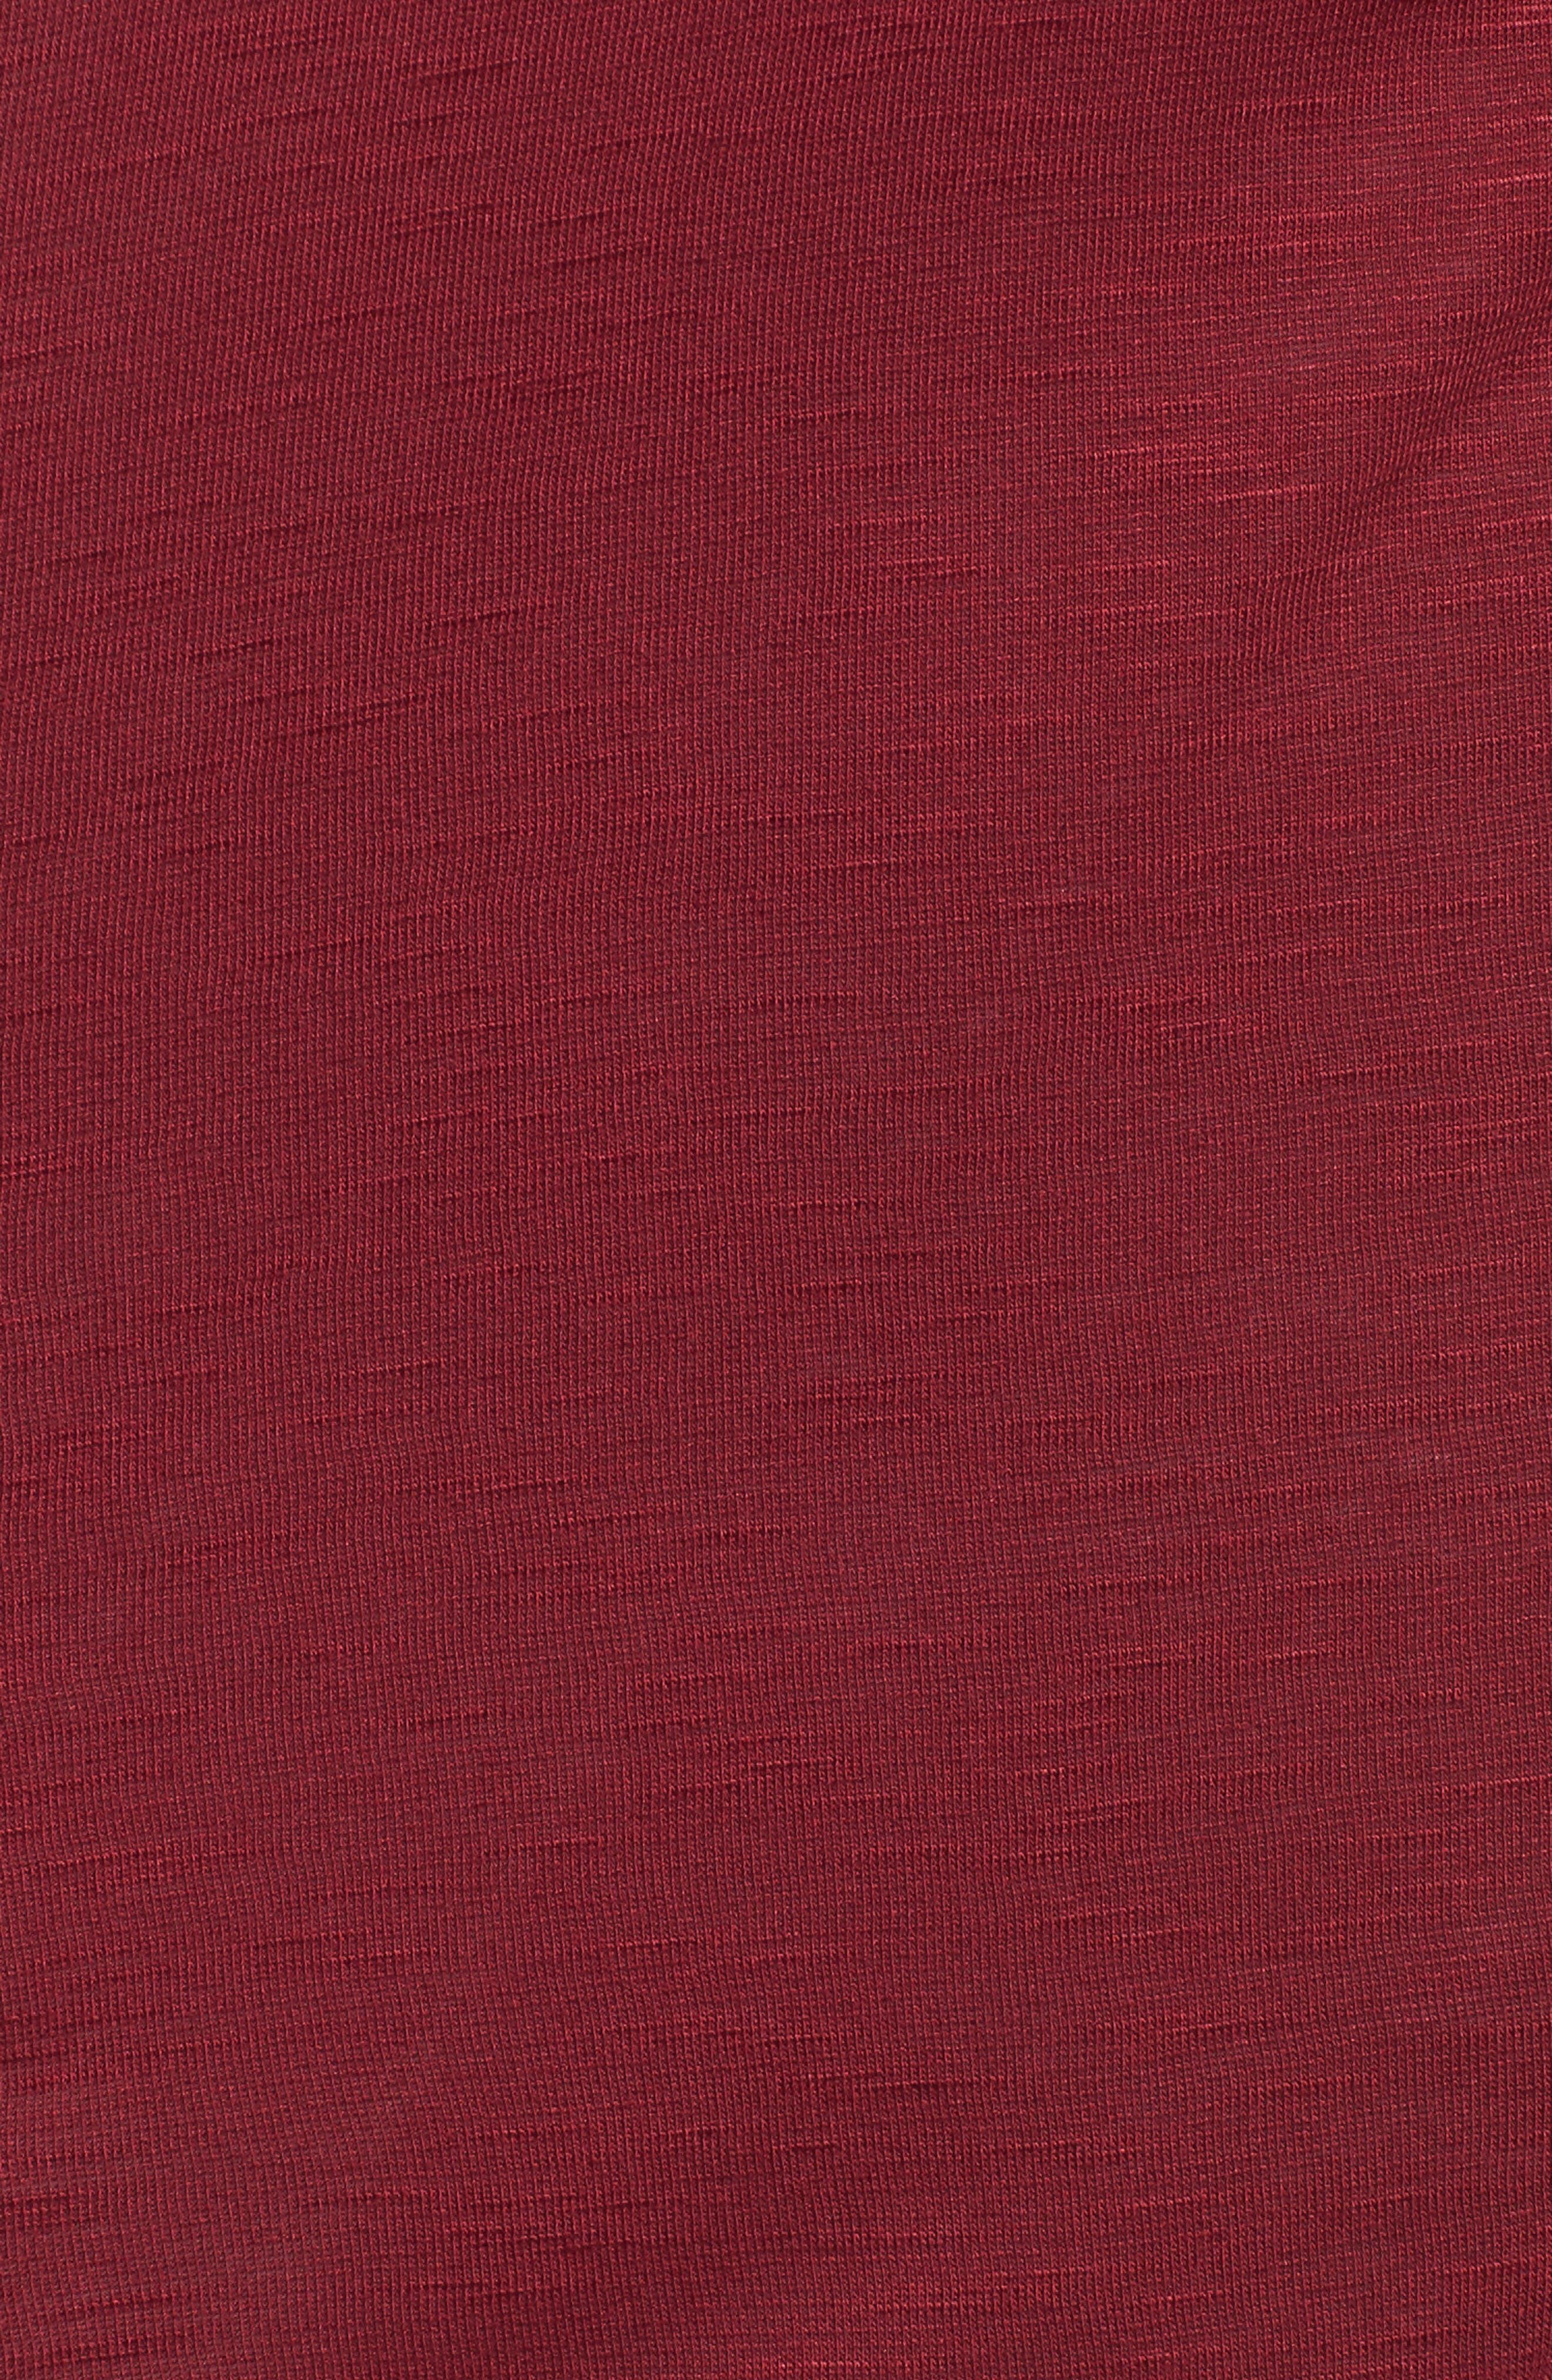 Drapey Pocket Cardigan,                             Alternate thumbnail 5, color,                             Plum